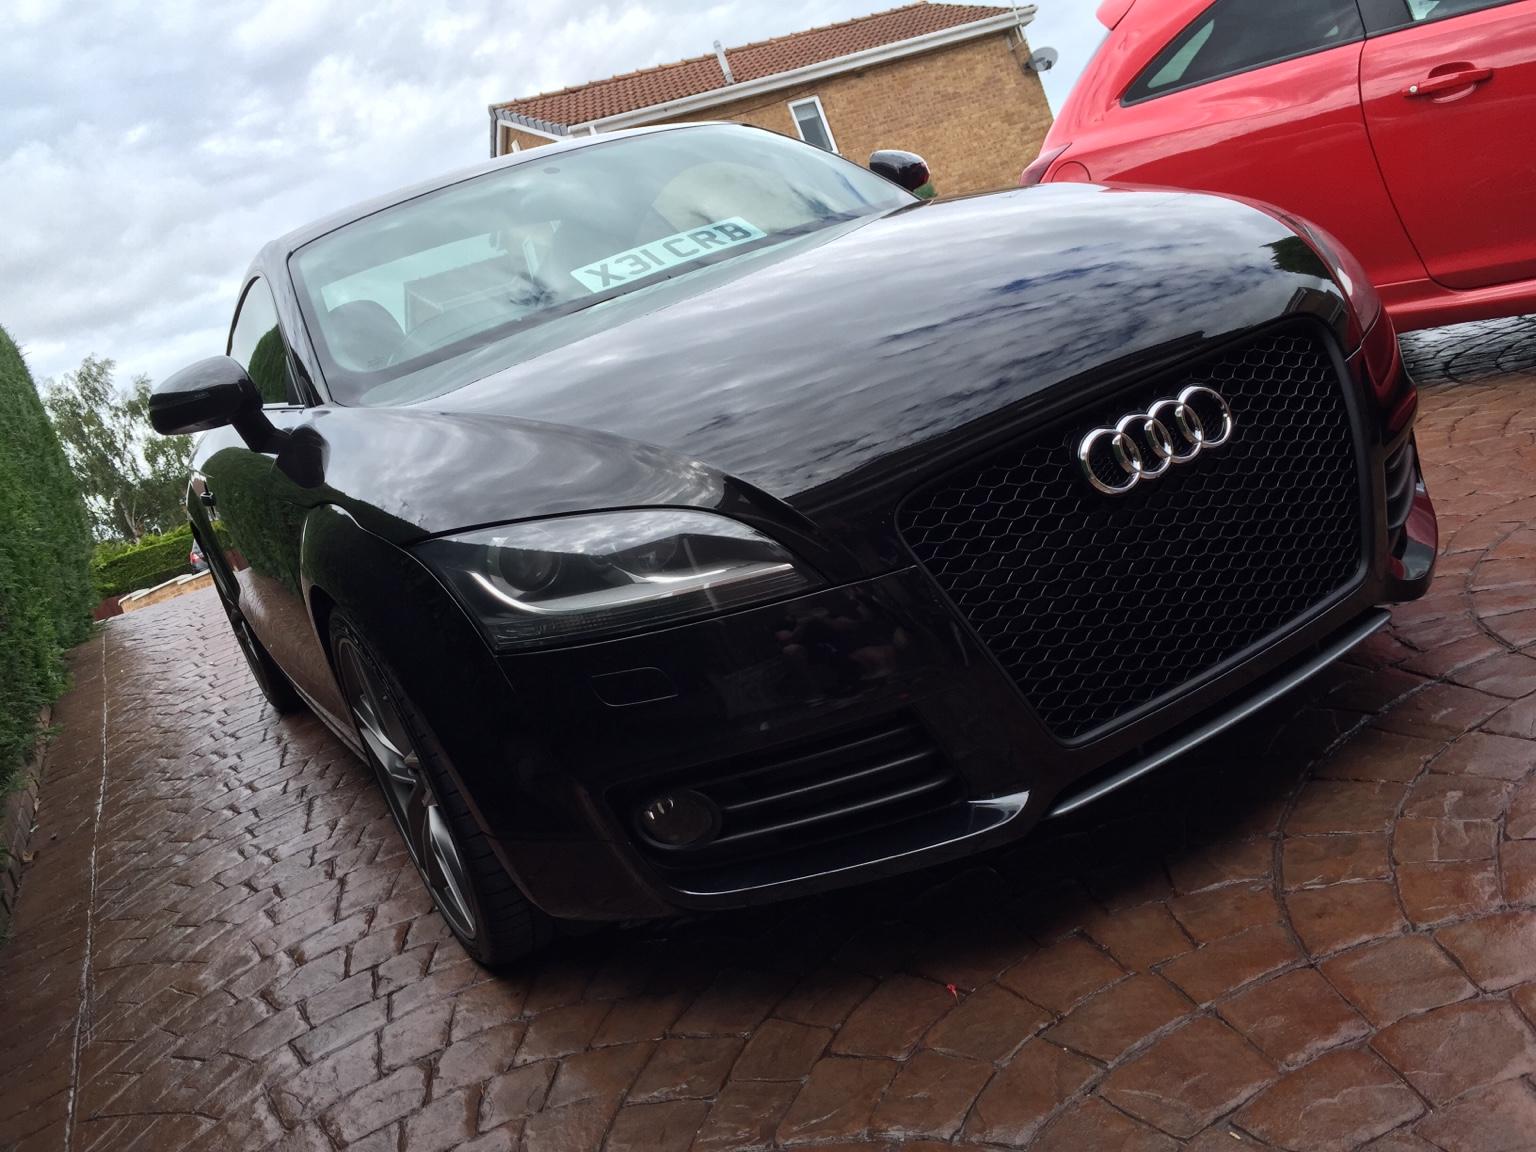 The Audi TT Forum • View topic - finally got a pic...